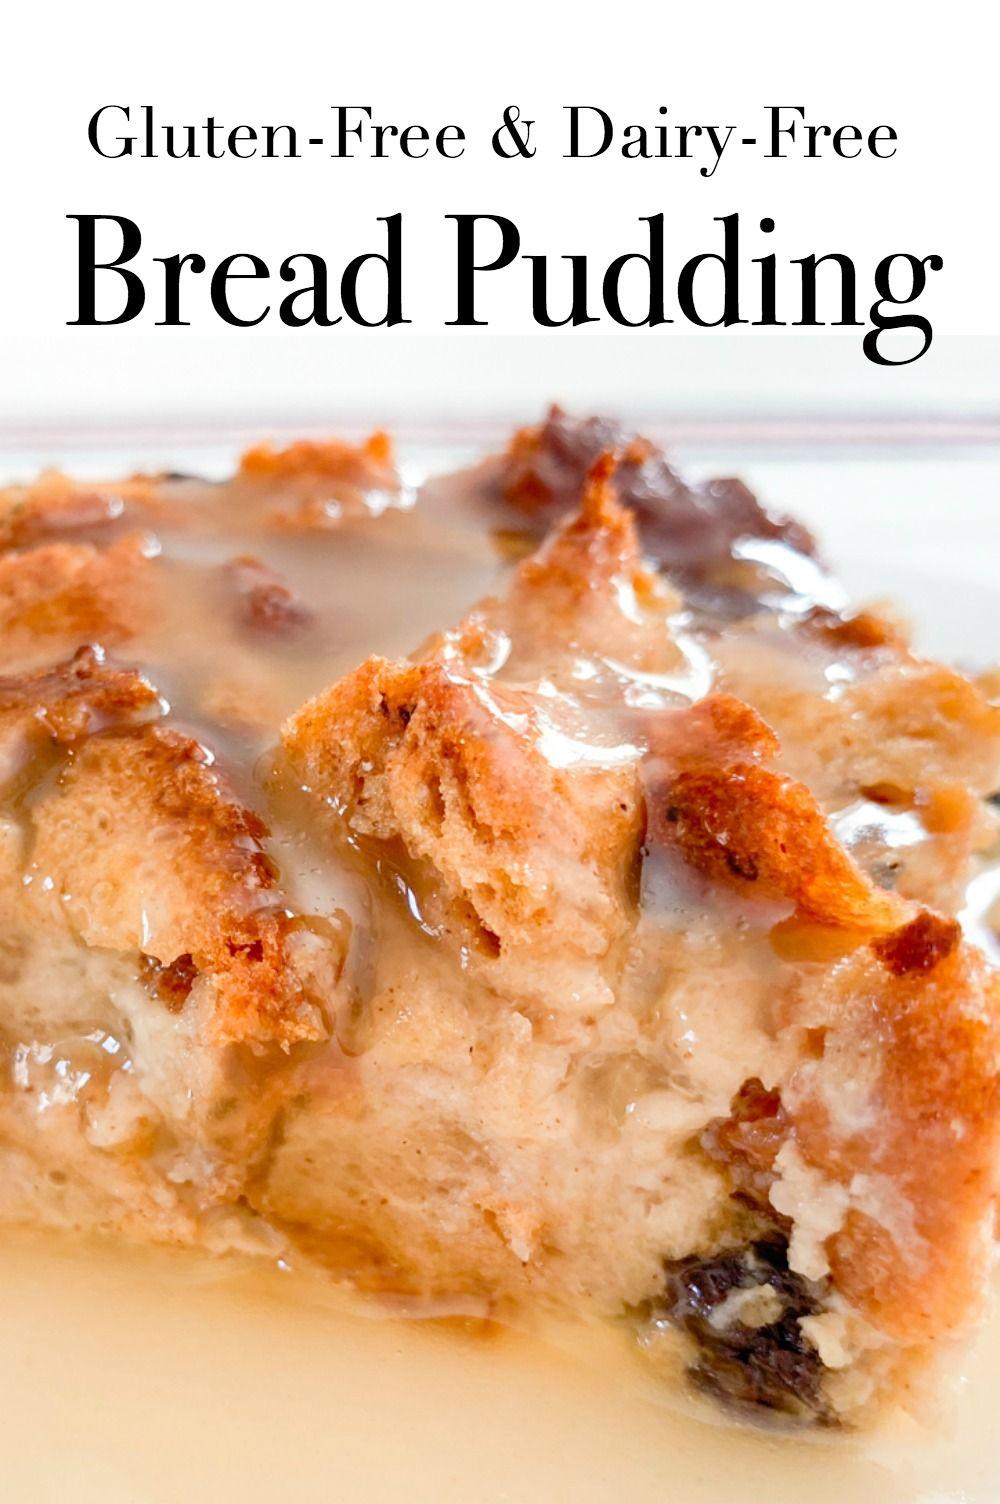 Gluten Free Bread Pudding Dairy Free Recipe Dairy Free Bread Gluten Free Bread Pudding Bread Pudding